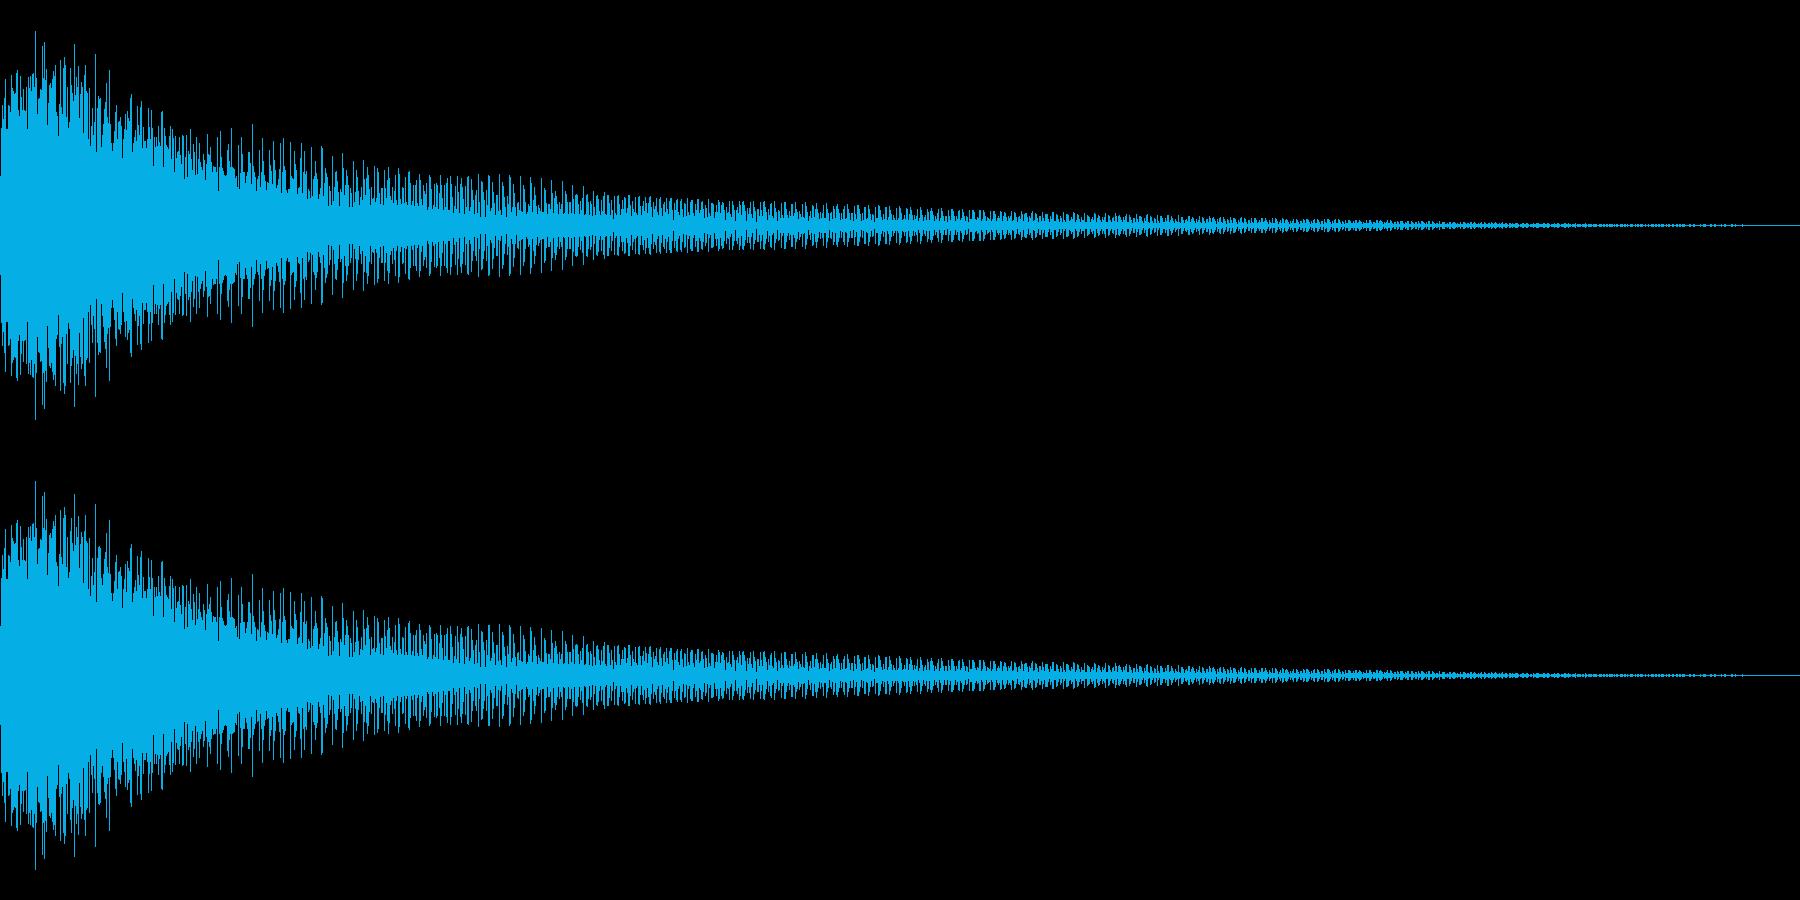 FM音源(ガーン、ギャーン)の再生済みの波形